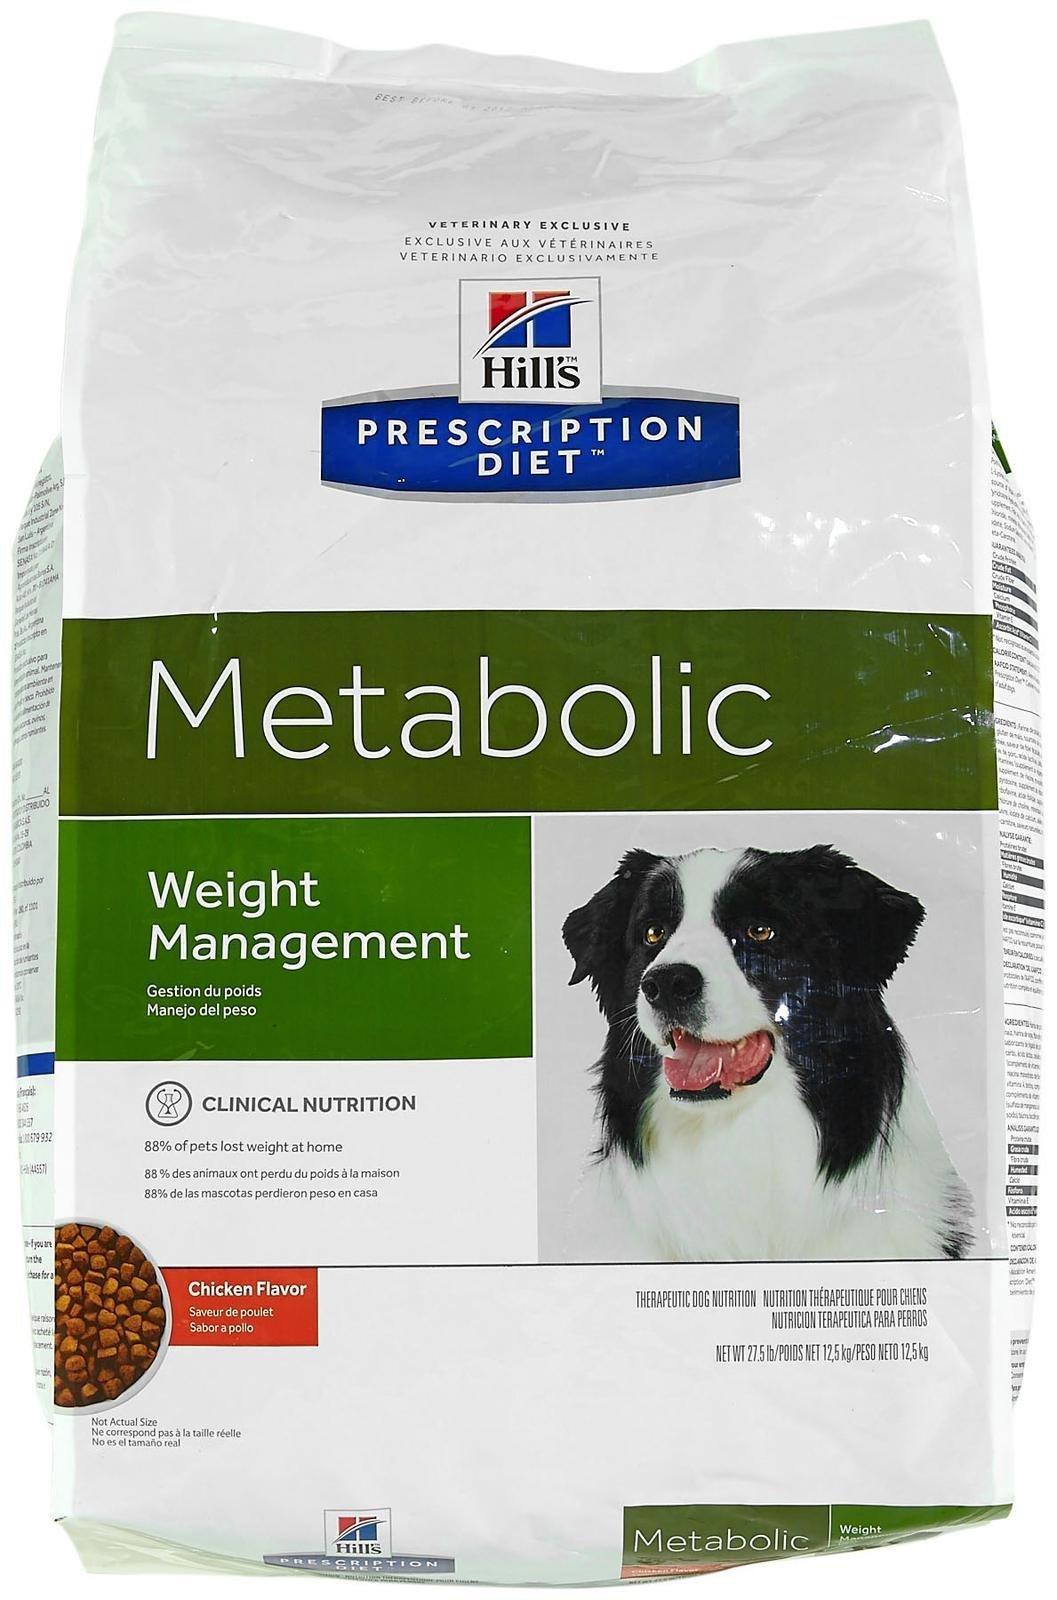 Hill's Prescription Diet Metabolic Canine Dry Dog Food, 27.5-lb bag